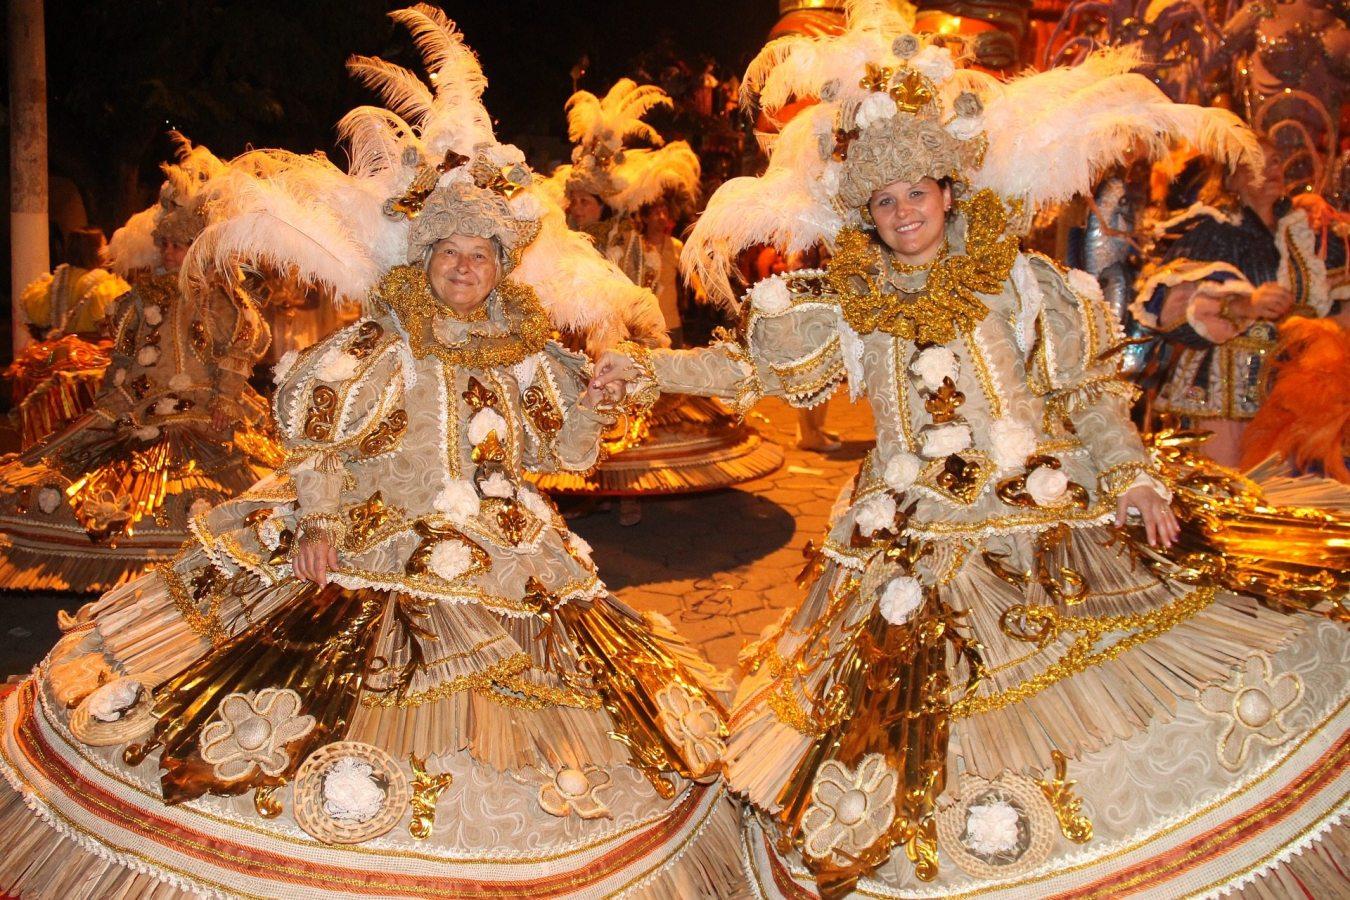 America del sur carnaval